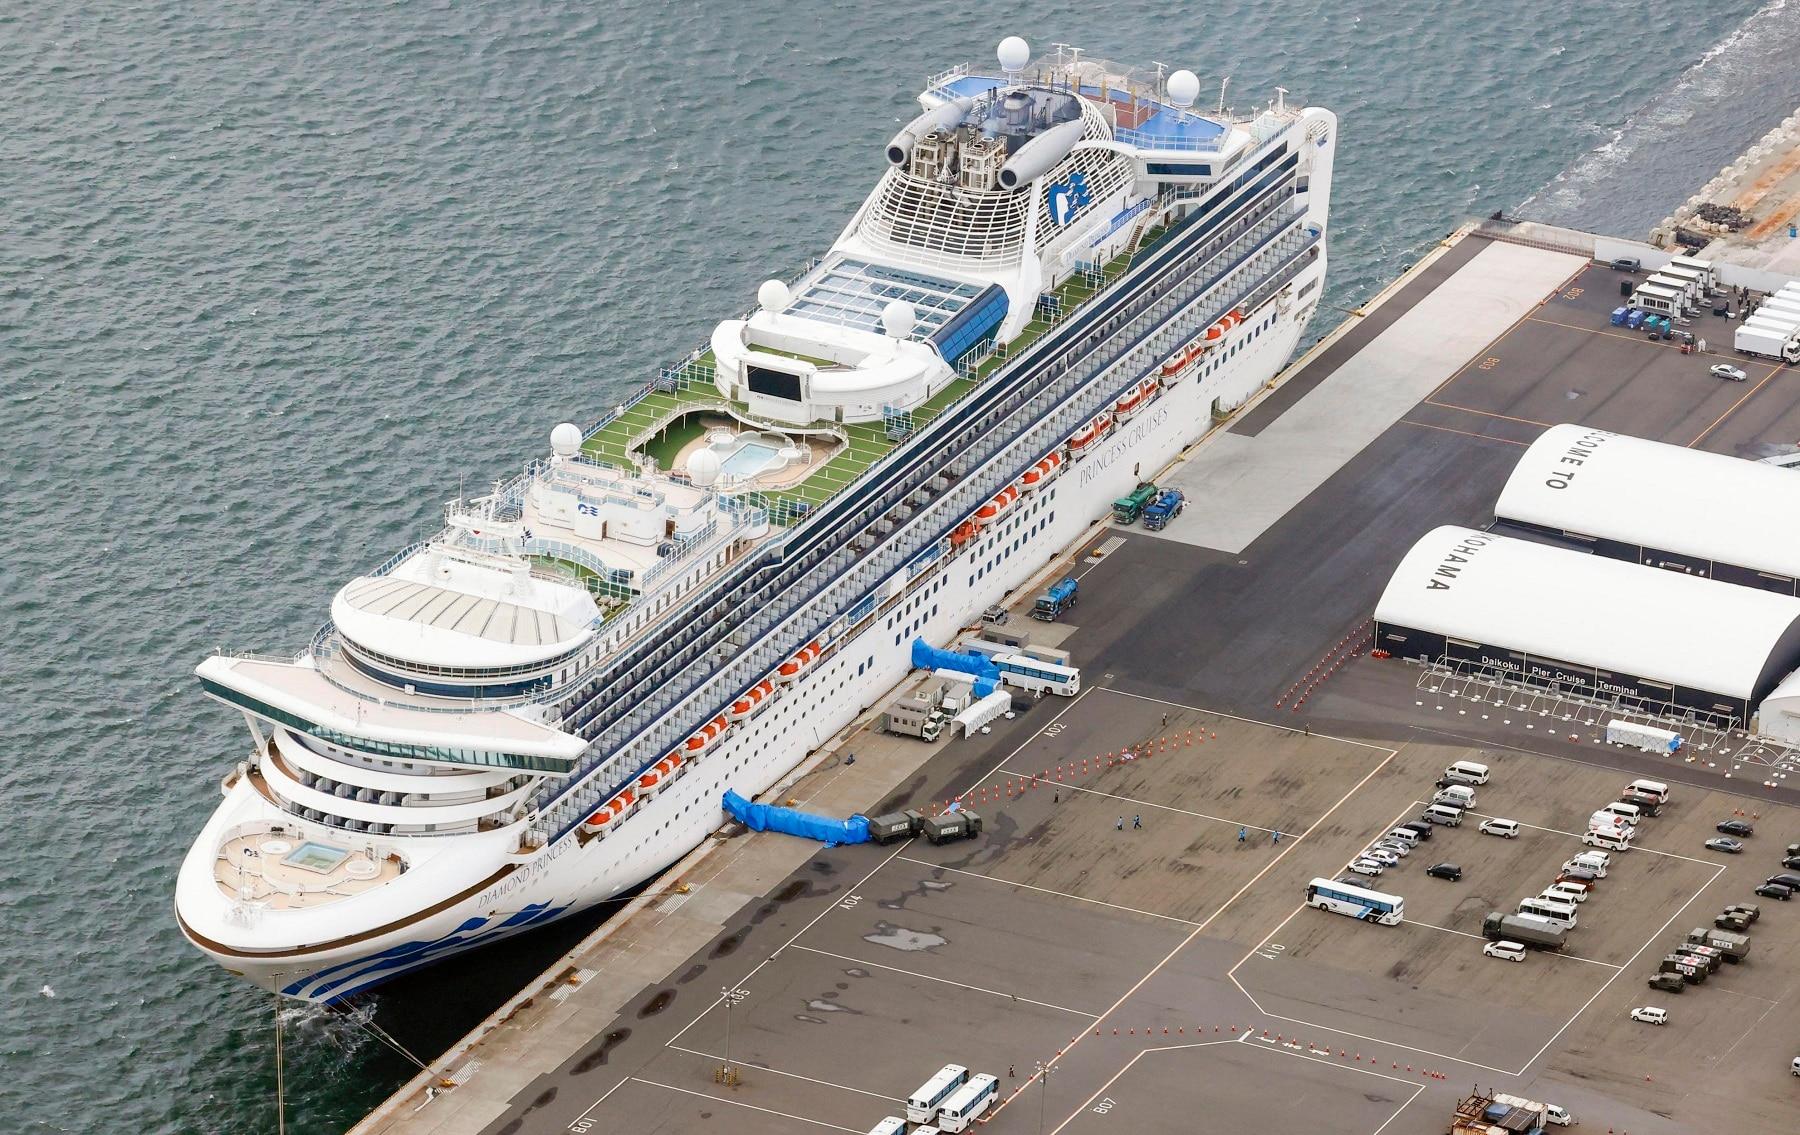 The coronavirus-hit Diamond Princess cruise ship at Yokohama Port near Tokyo.